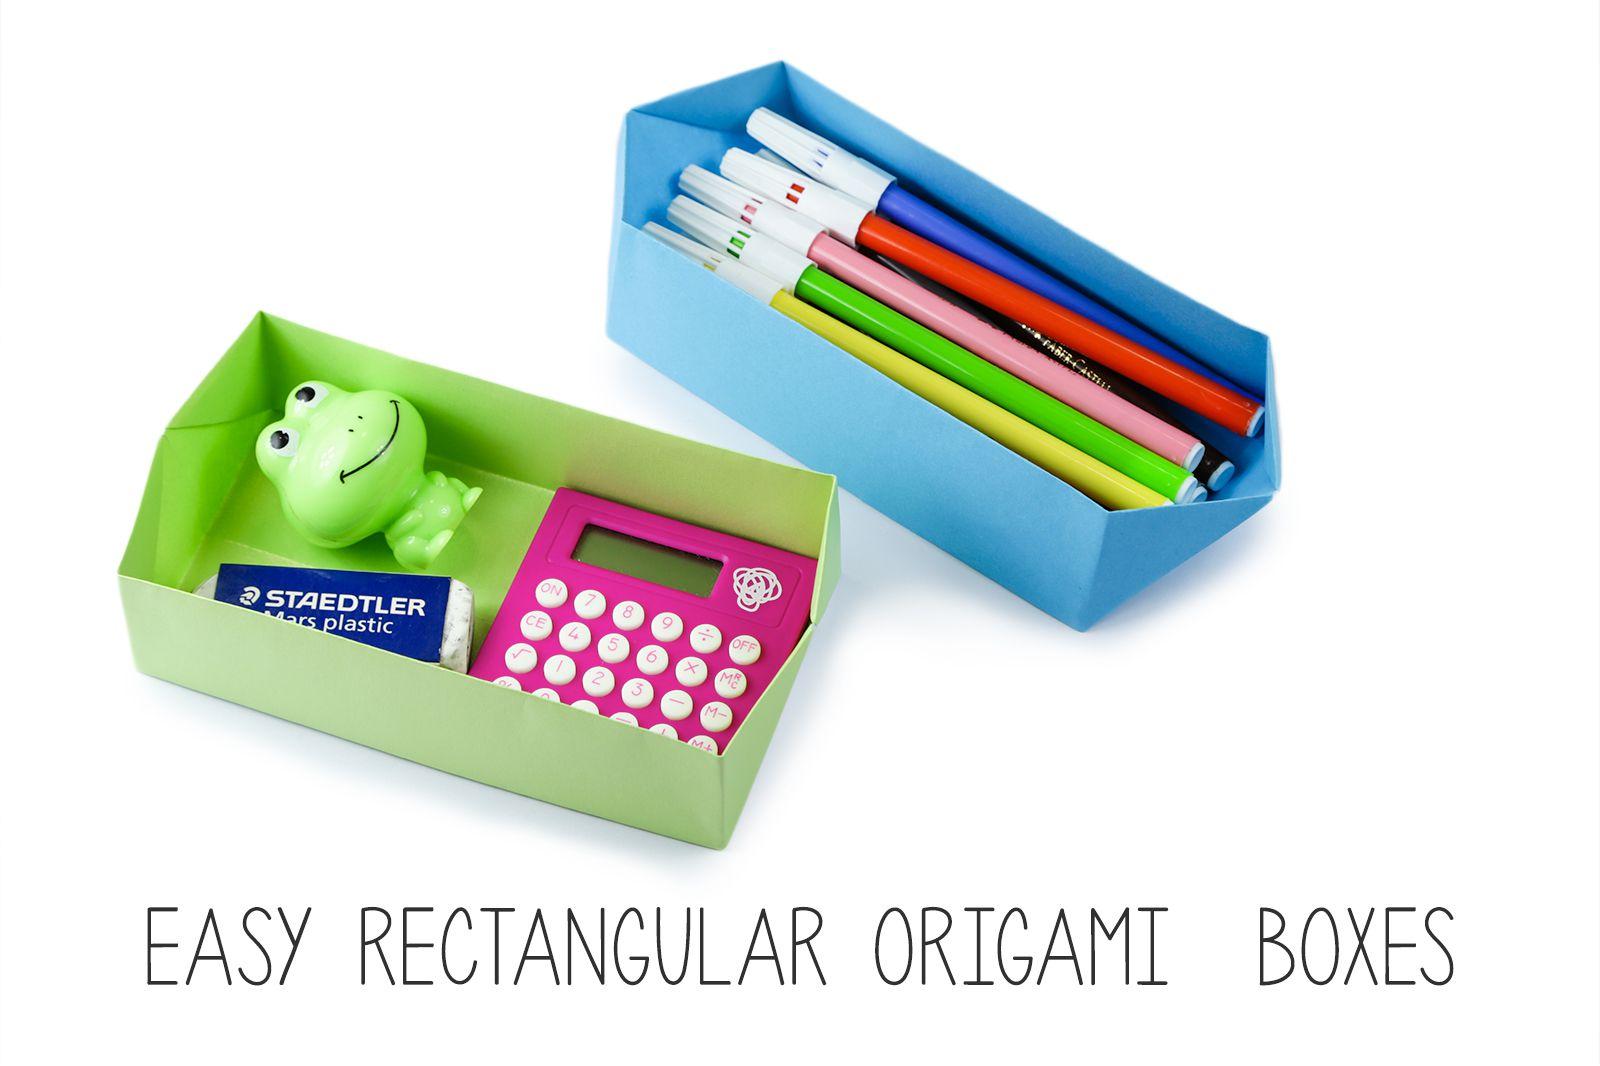 Easy rectangular origami box instructions jeuxipadfo Image collections